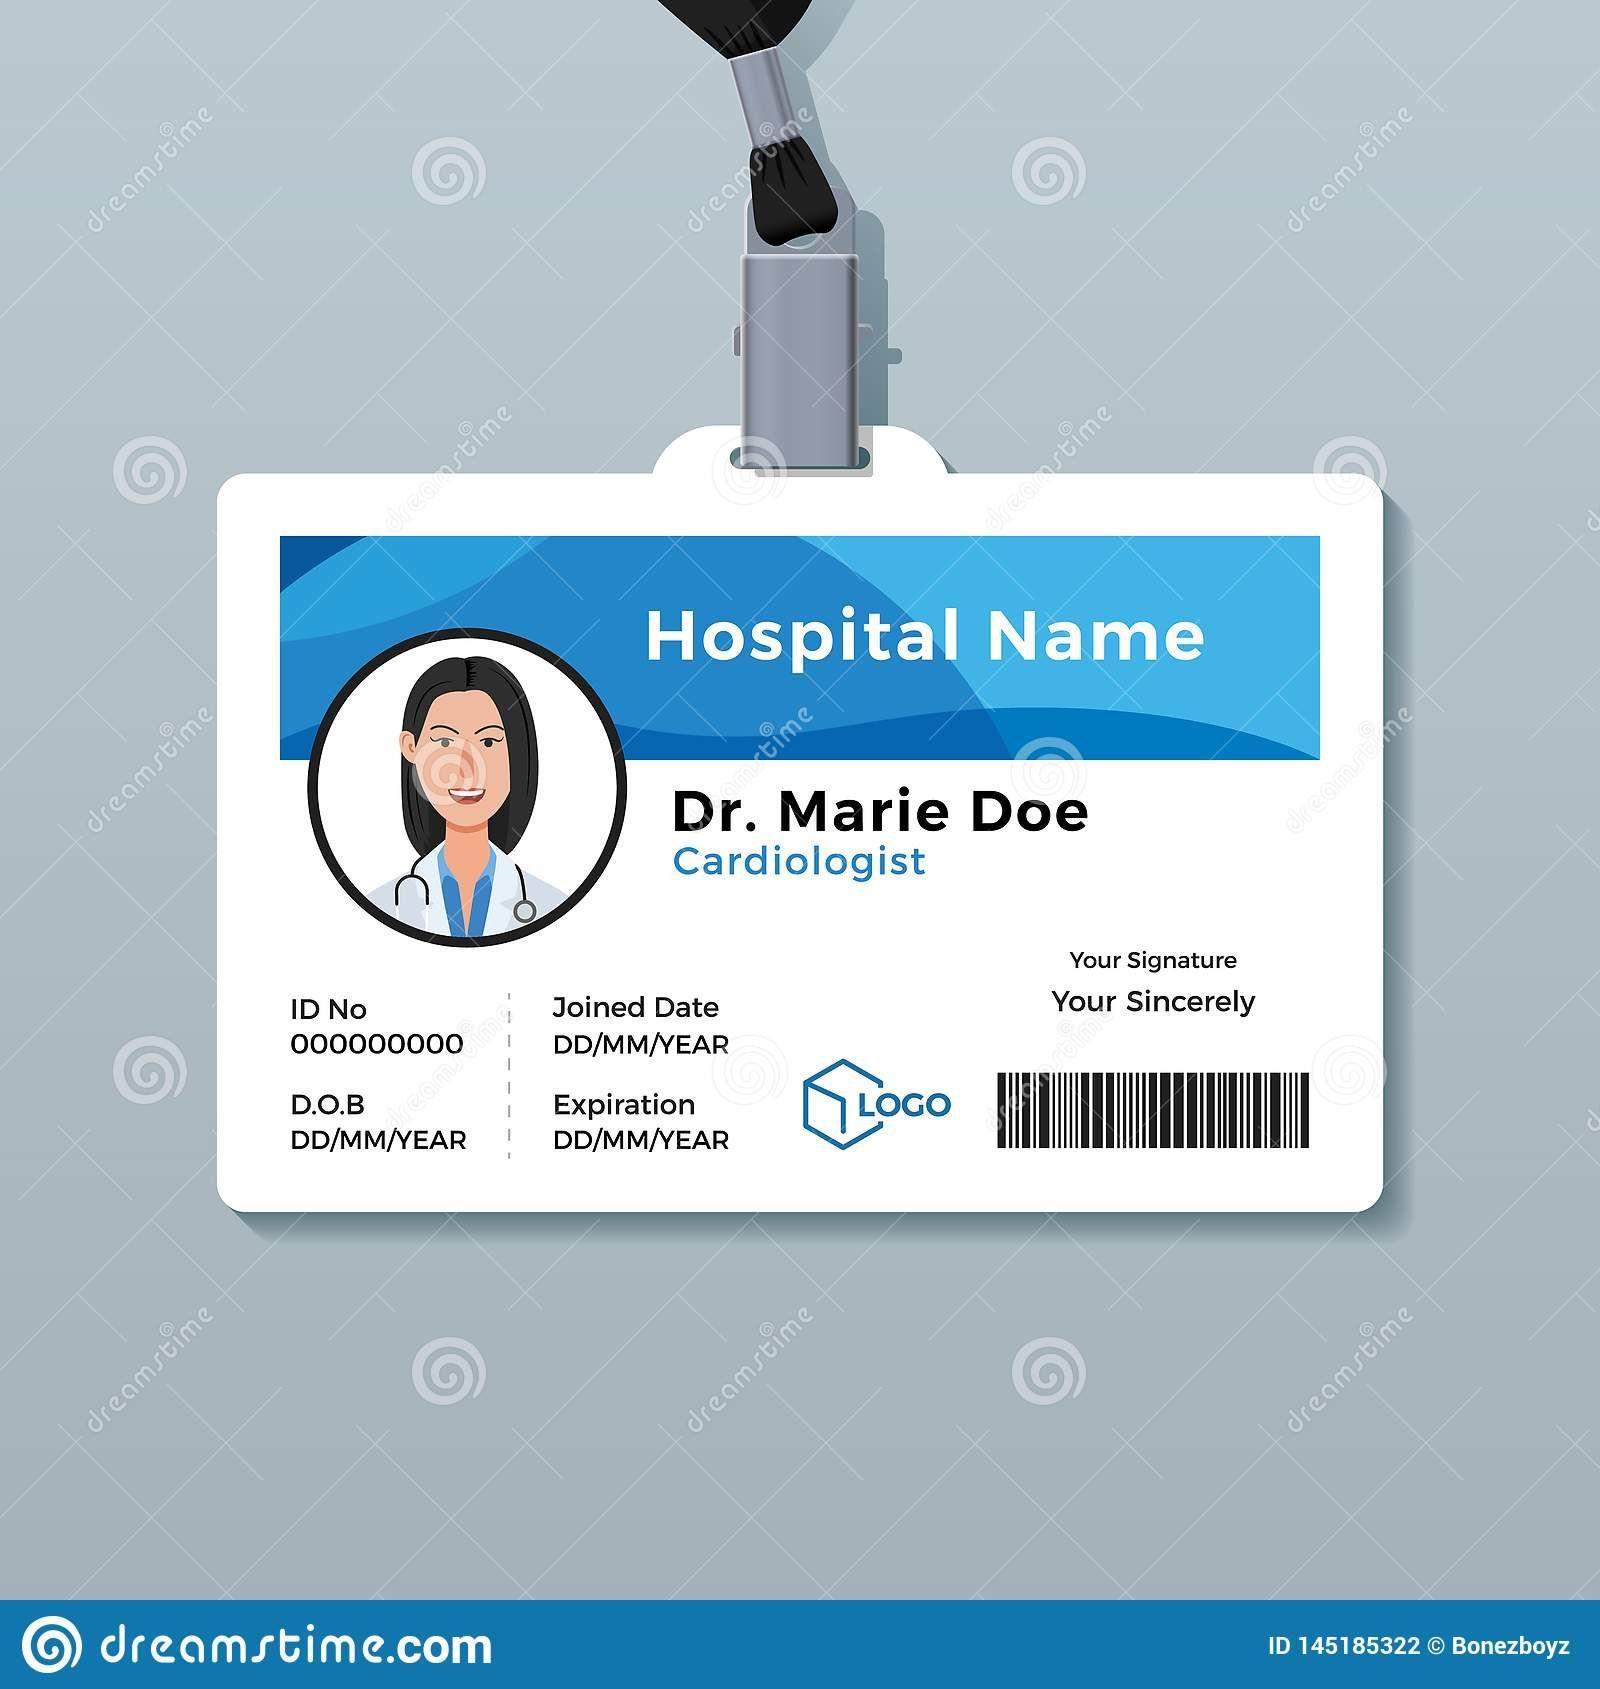 Medical Information Custom Id Badge 1 Id Card Template Card Template Card Templates